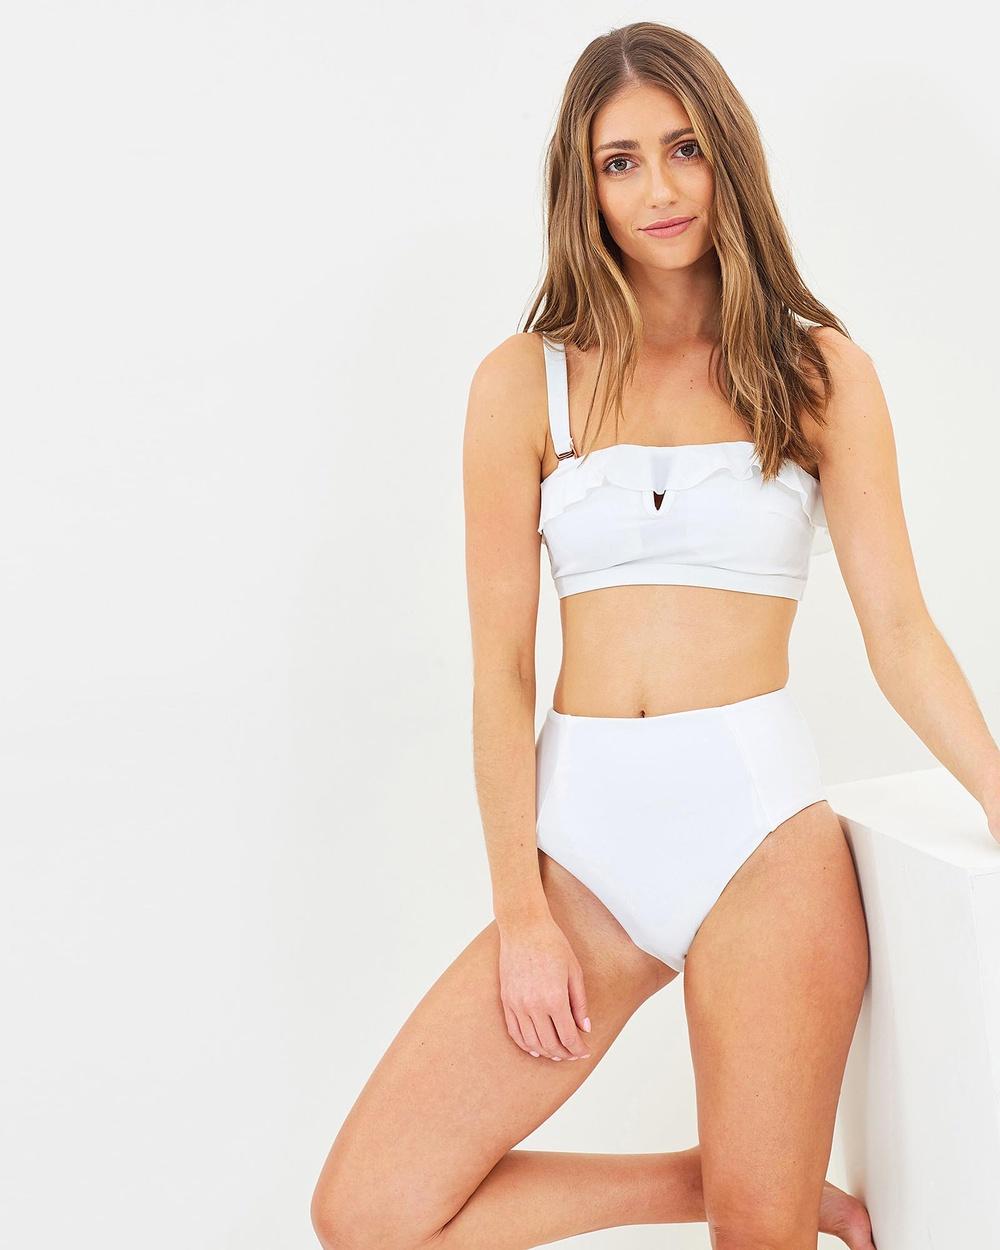 Ete Swimwear Santa Cruz High Waisted Bottoms Bikini Bottoms White Santa Cruz High-Waisted Bottoms